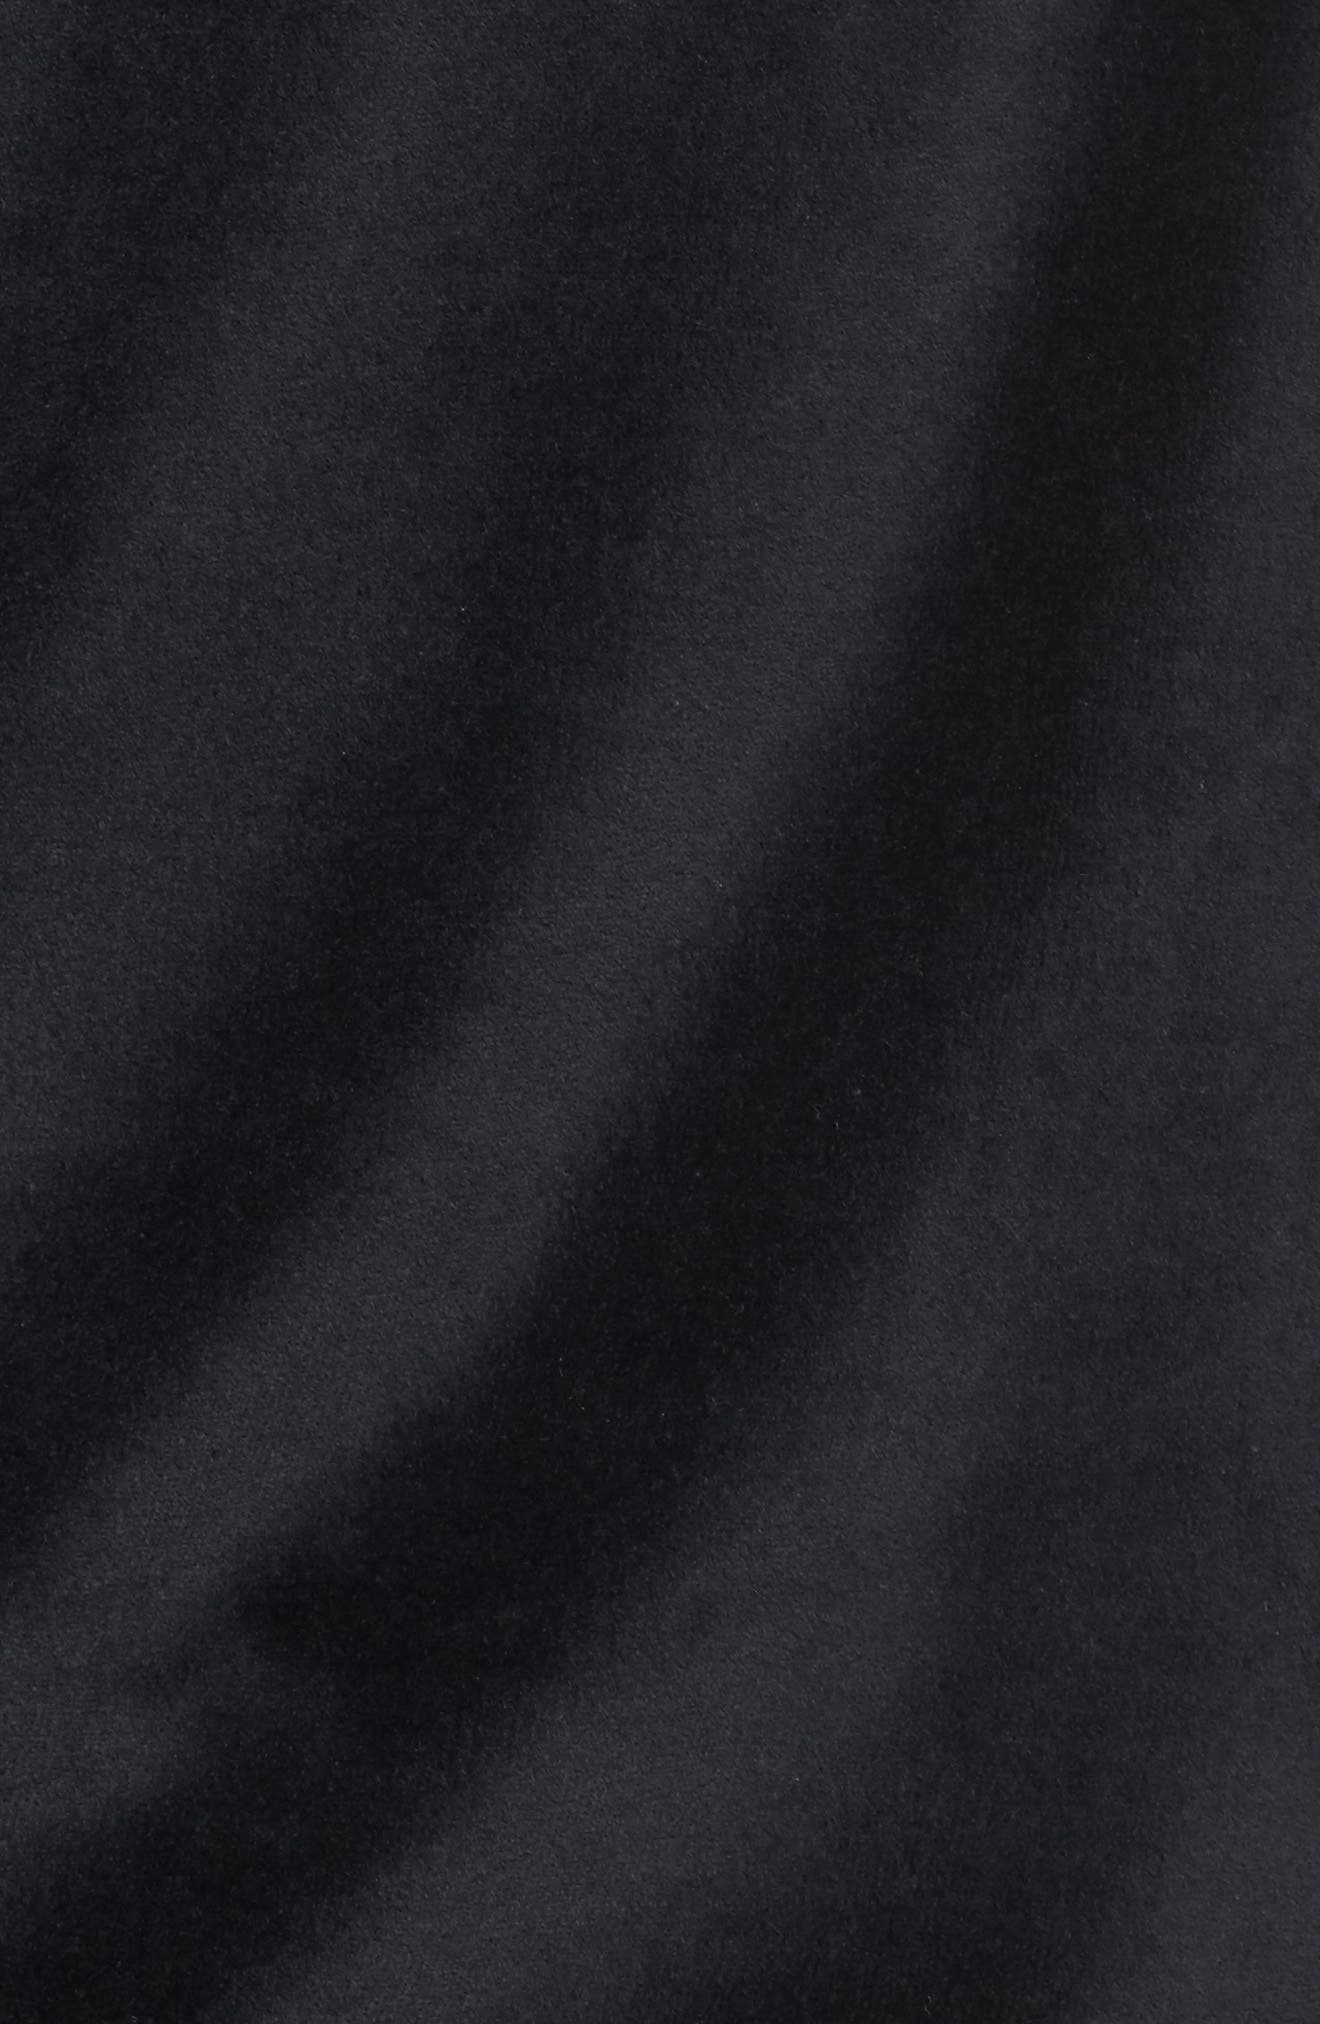 Authentic Mivvie Track Jacket,                             Alternate thumbnail 6, color,                             001